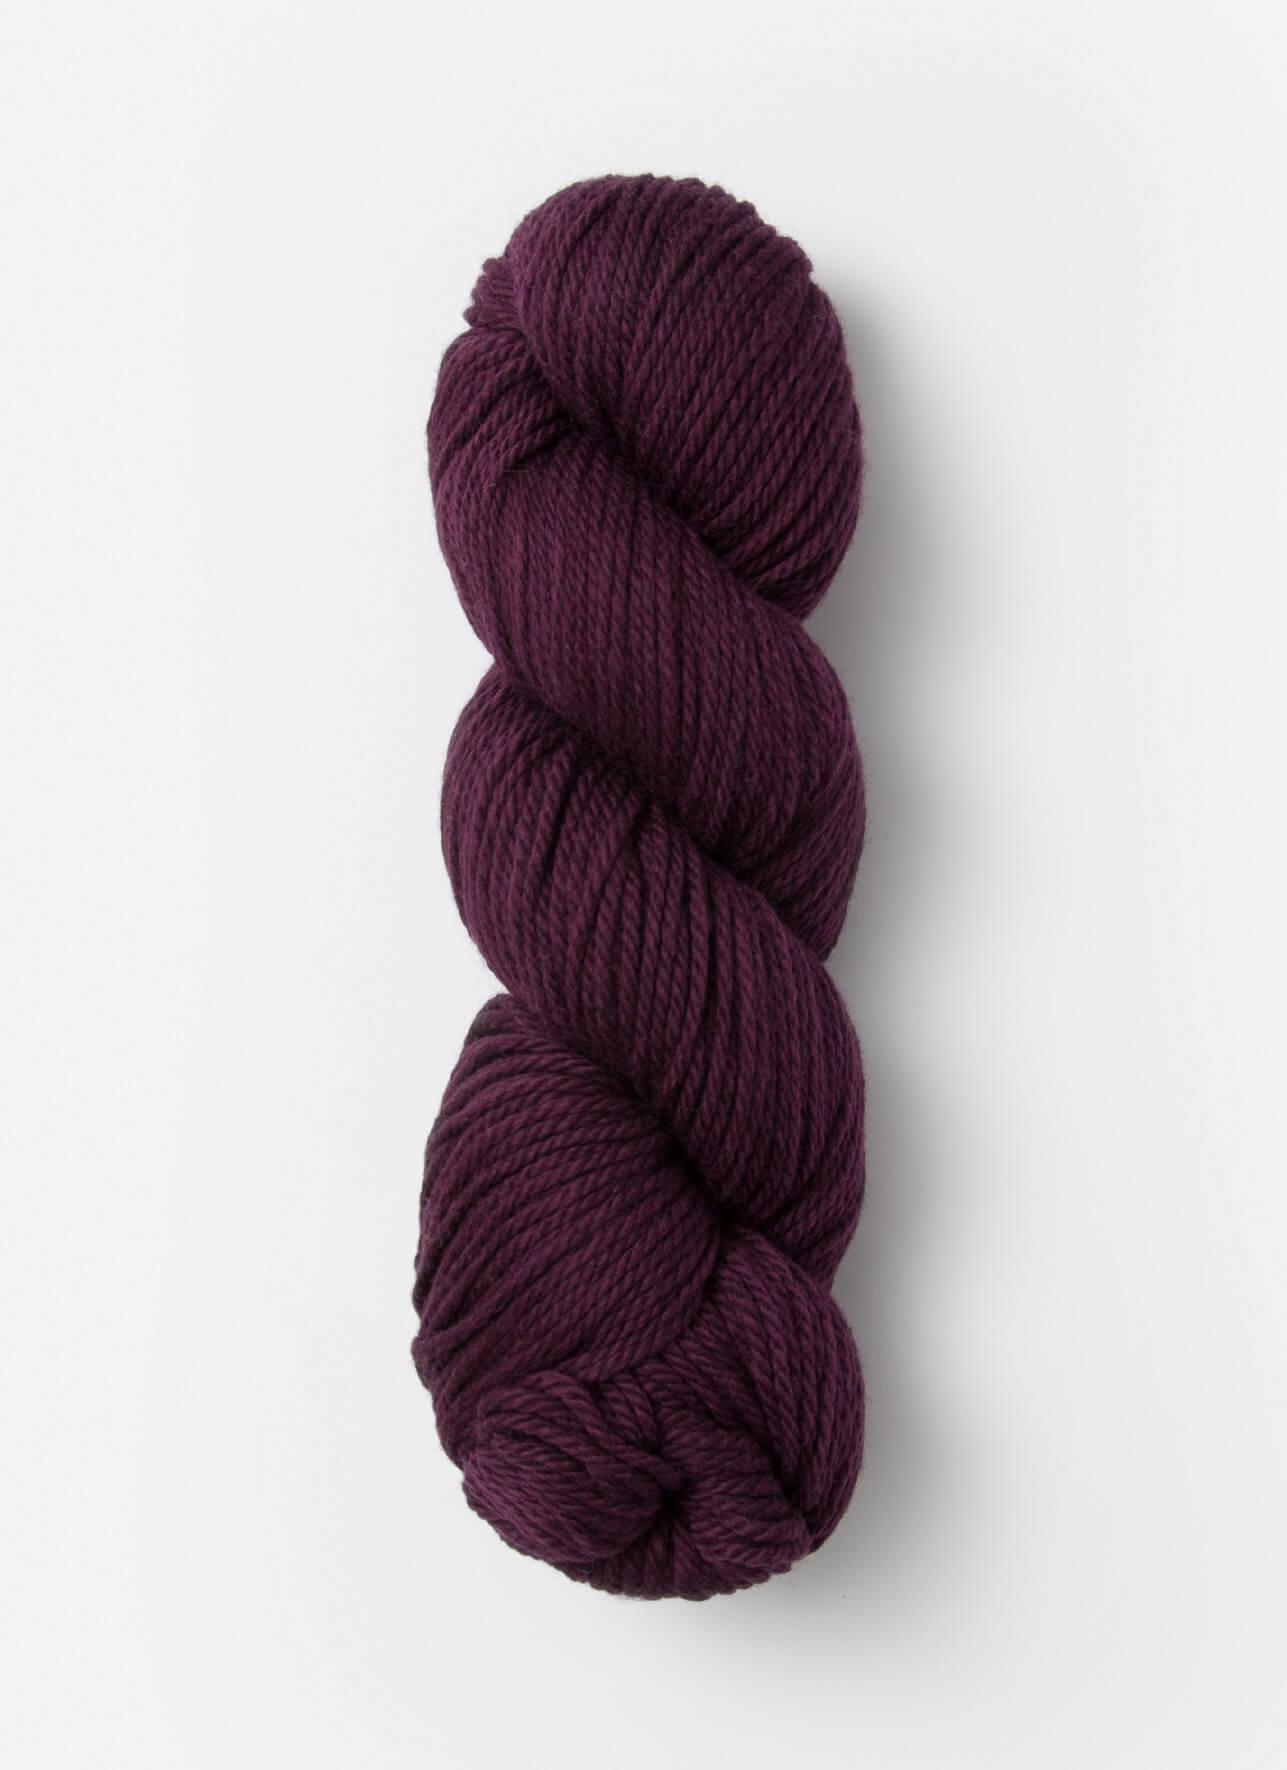 No. 7516: Grape Jelly